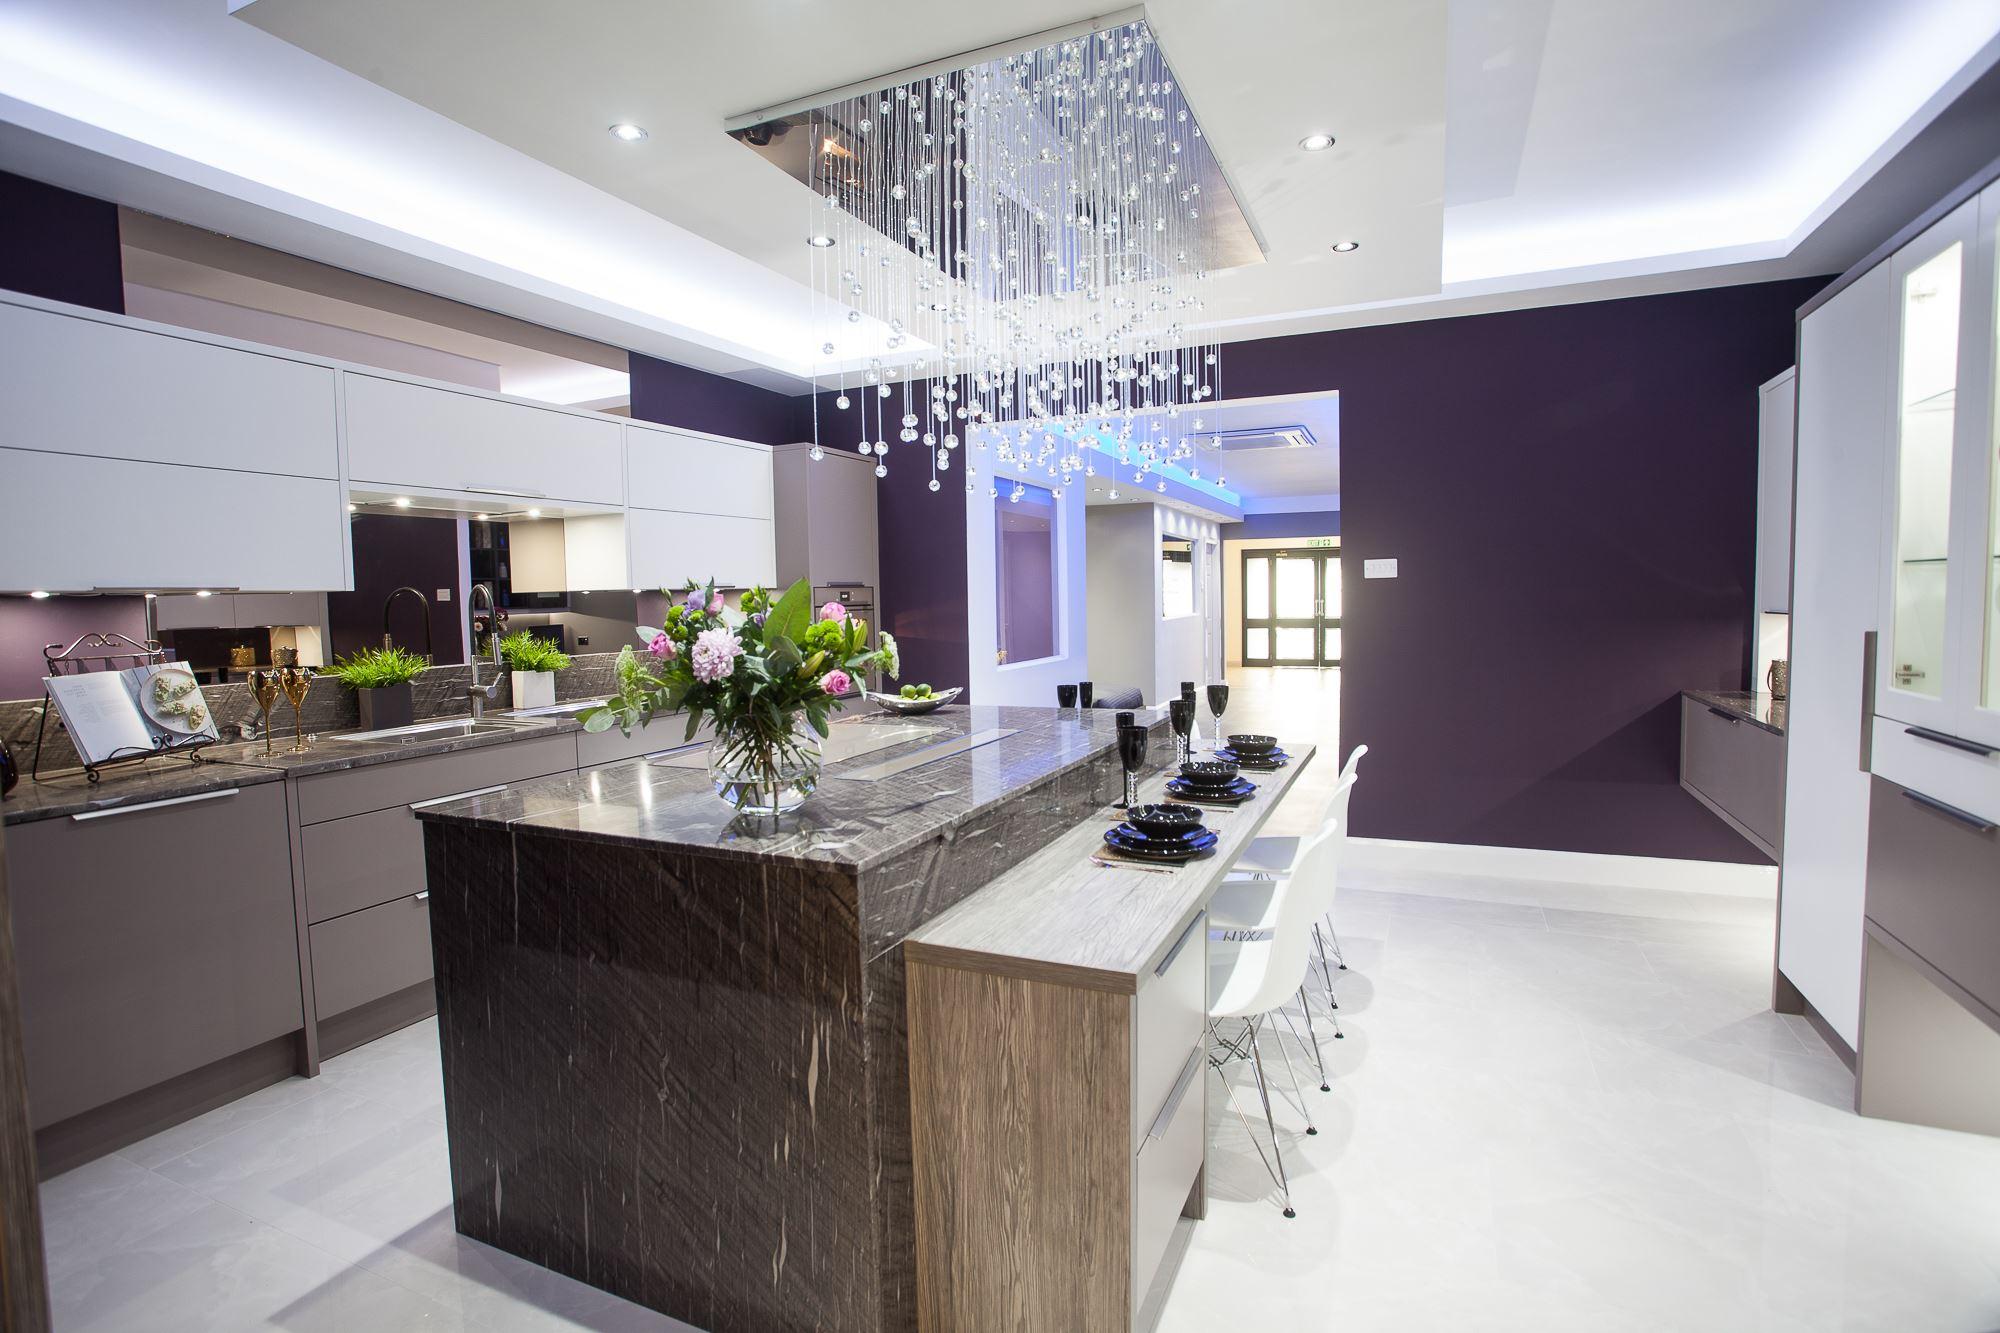 Cavendish KBB – Luxury kitchens, bedrooms and flooring